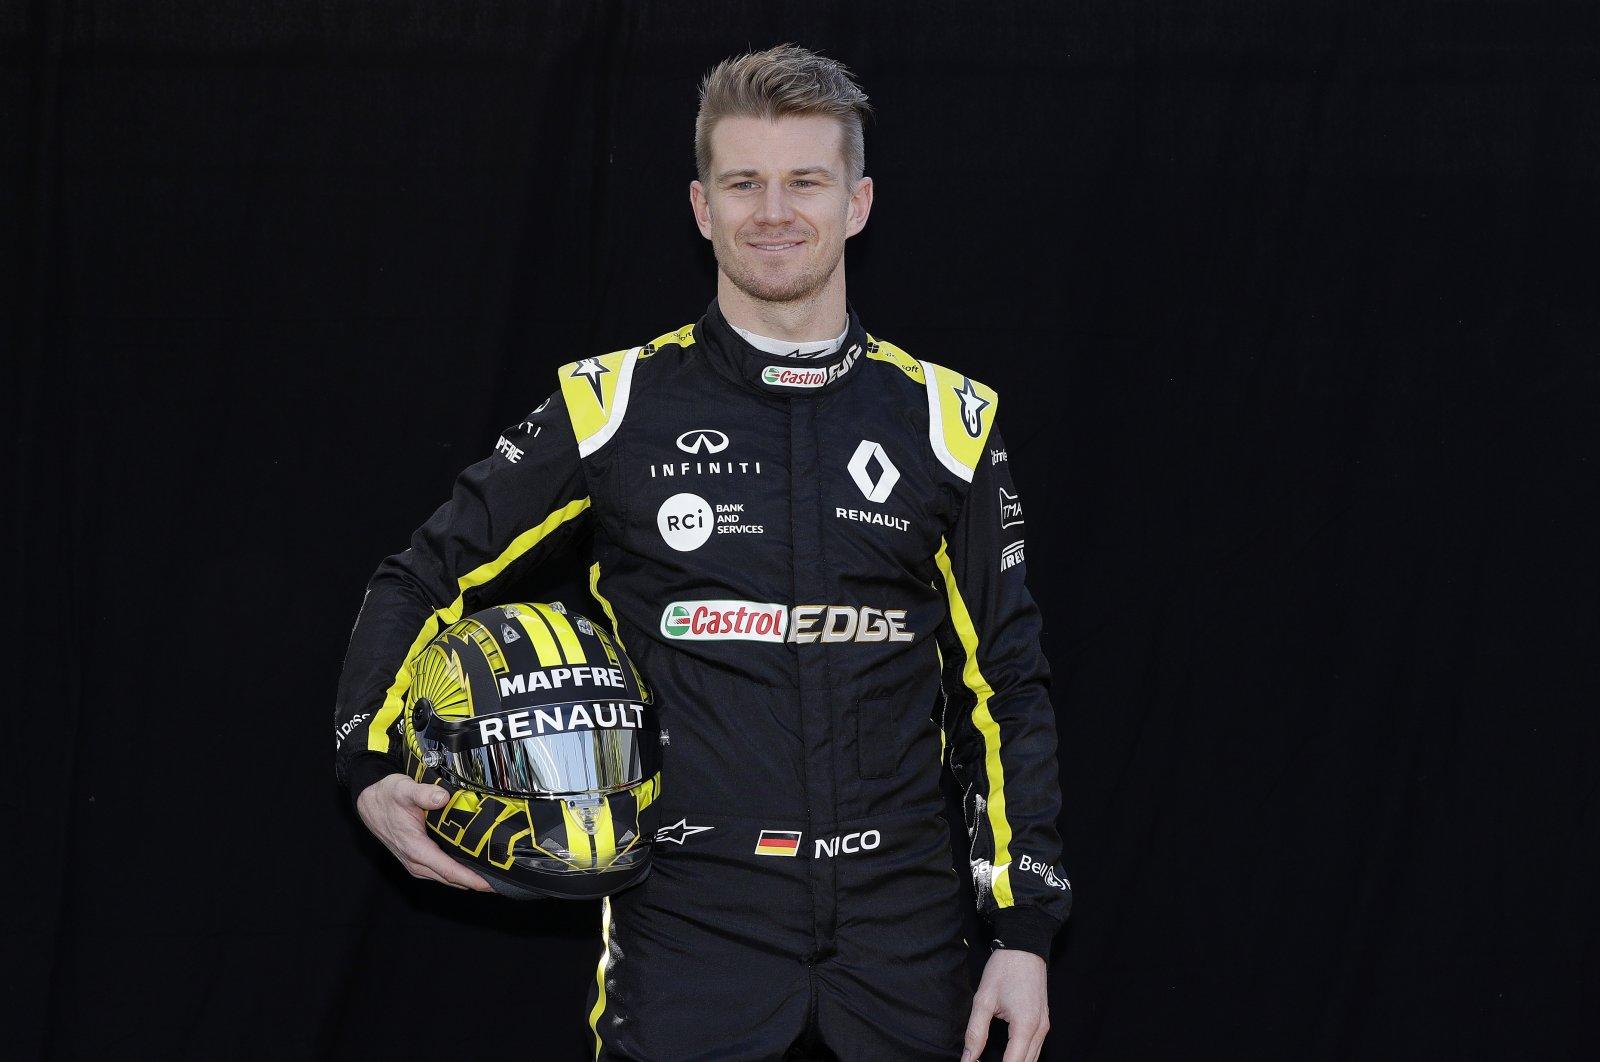 Nico Hulkenberg poses for a photo before F1 Australian GP in Melbourne, Australia, March 14, 2019. (AP Photo)